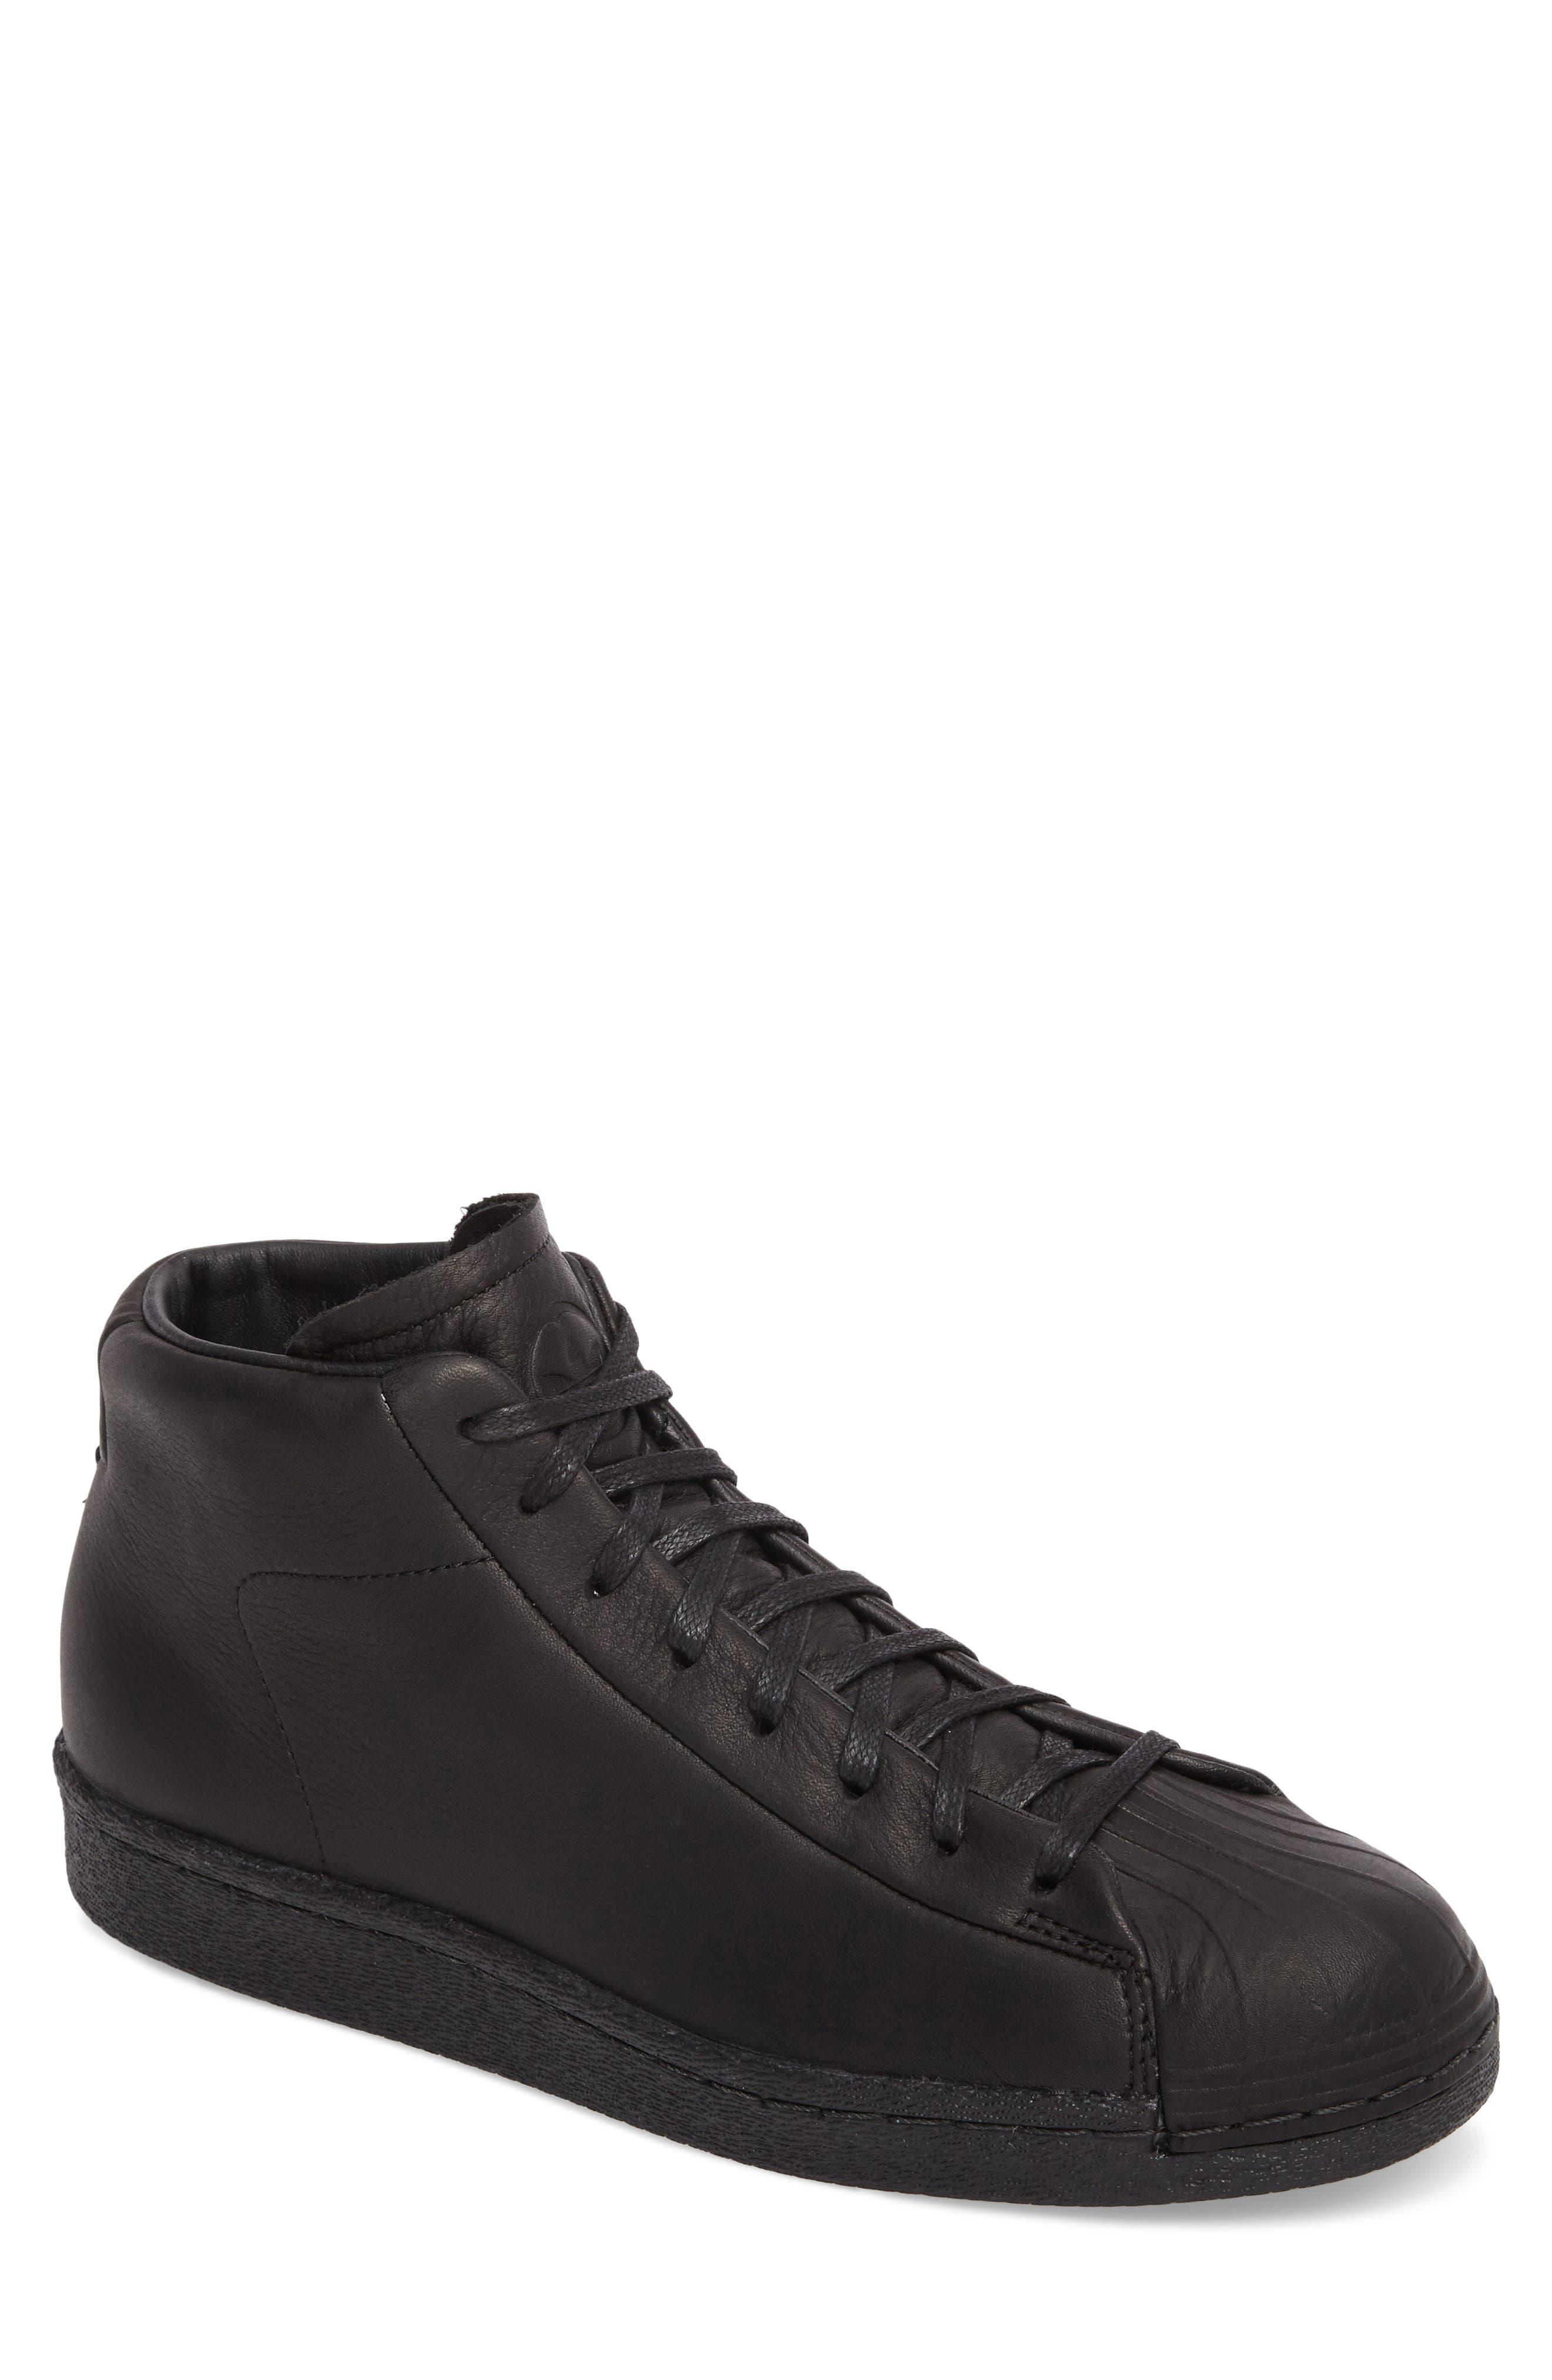 wings + horns x adidas High-Top Sneaker (Men)